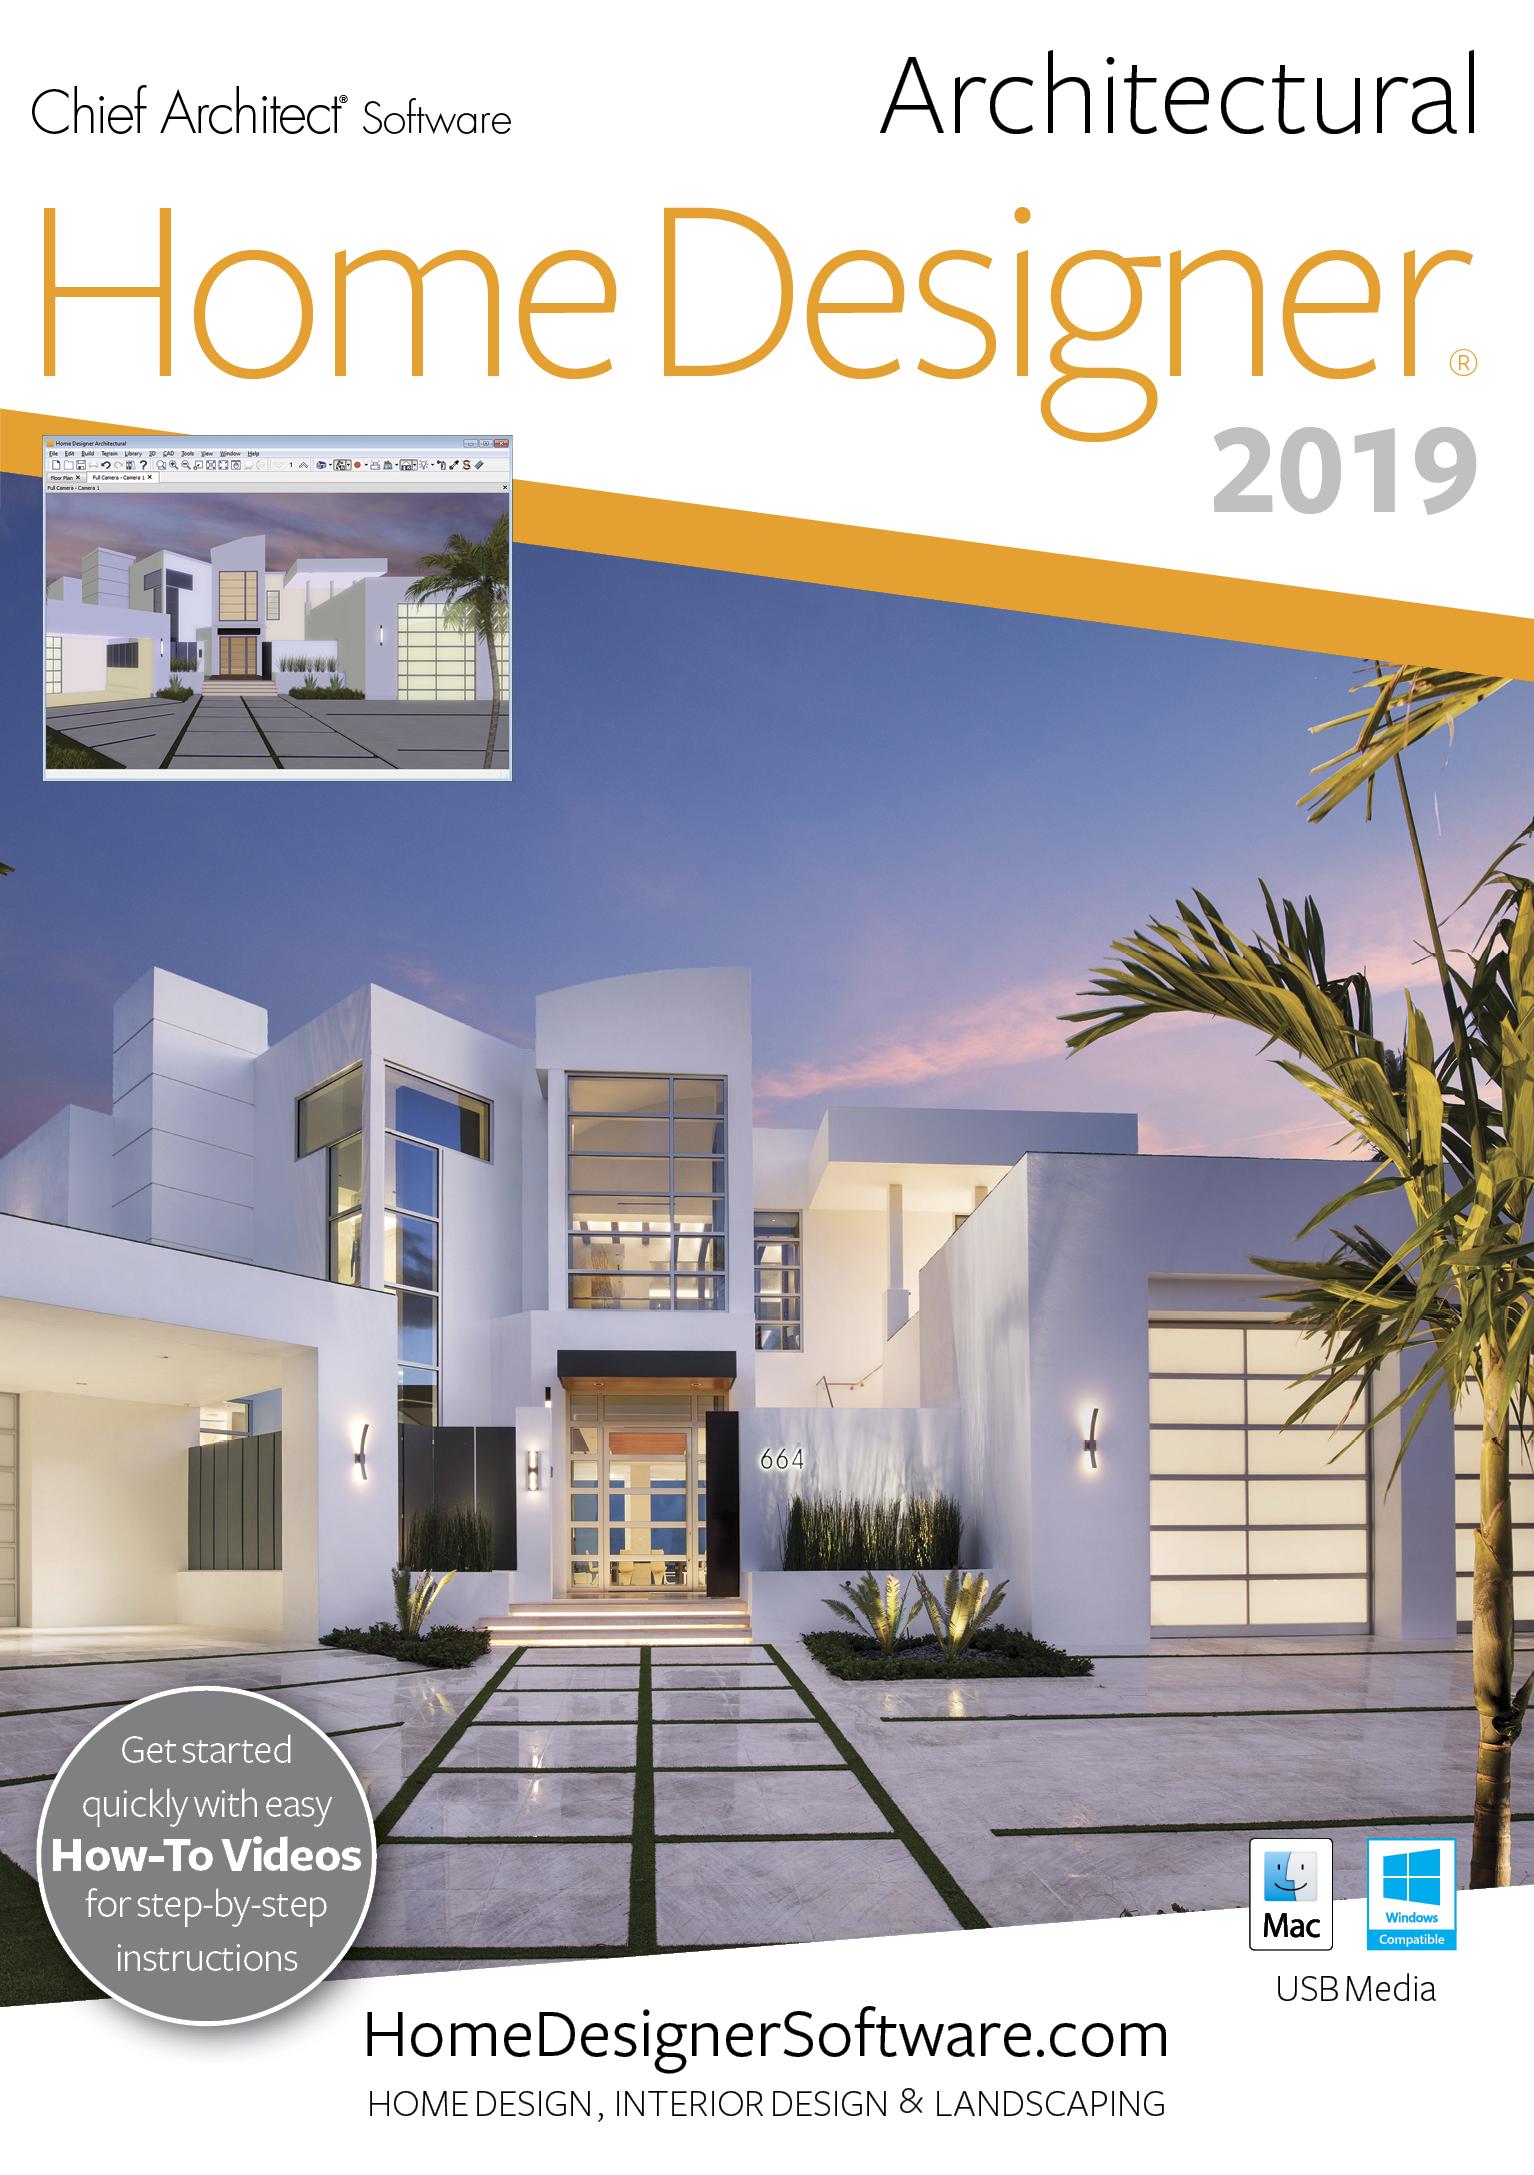 Home Designer Architectural 2019 - PC Download [Download]